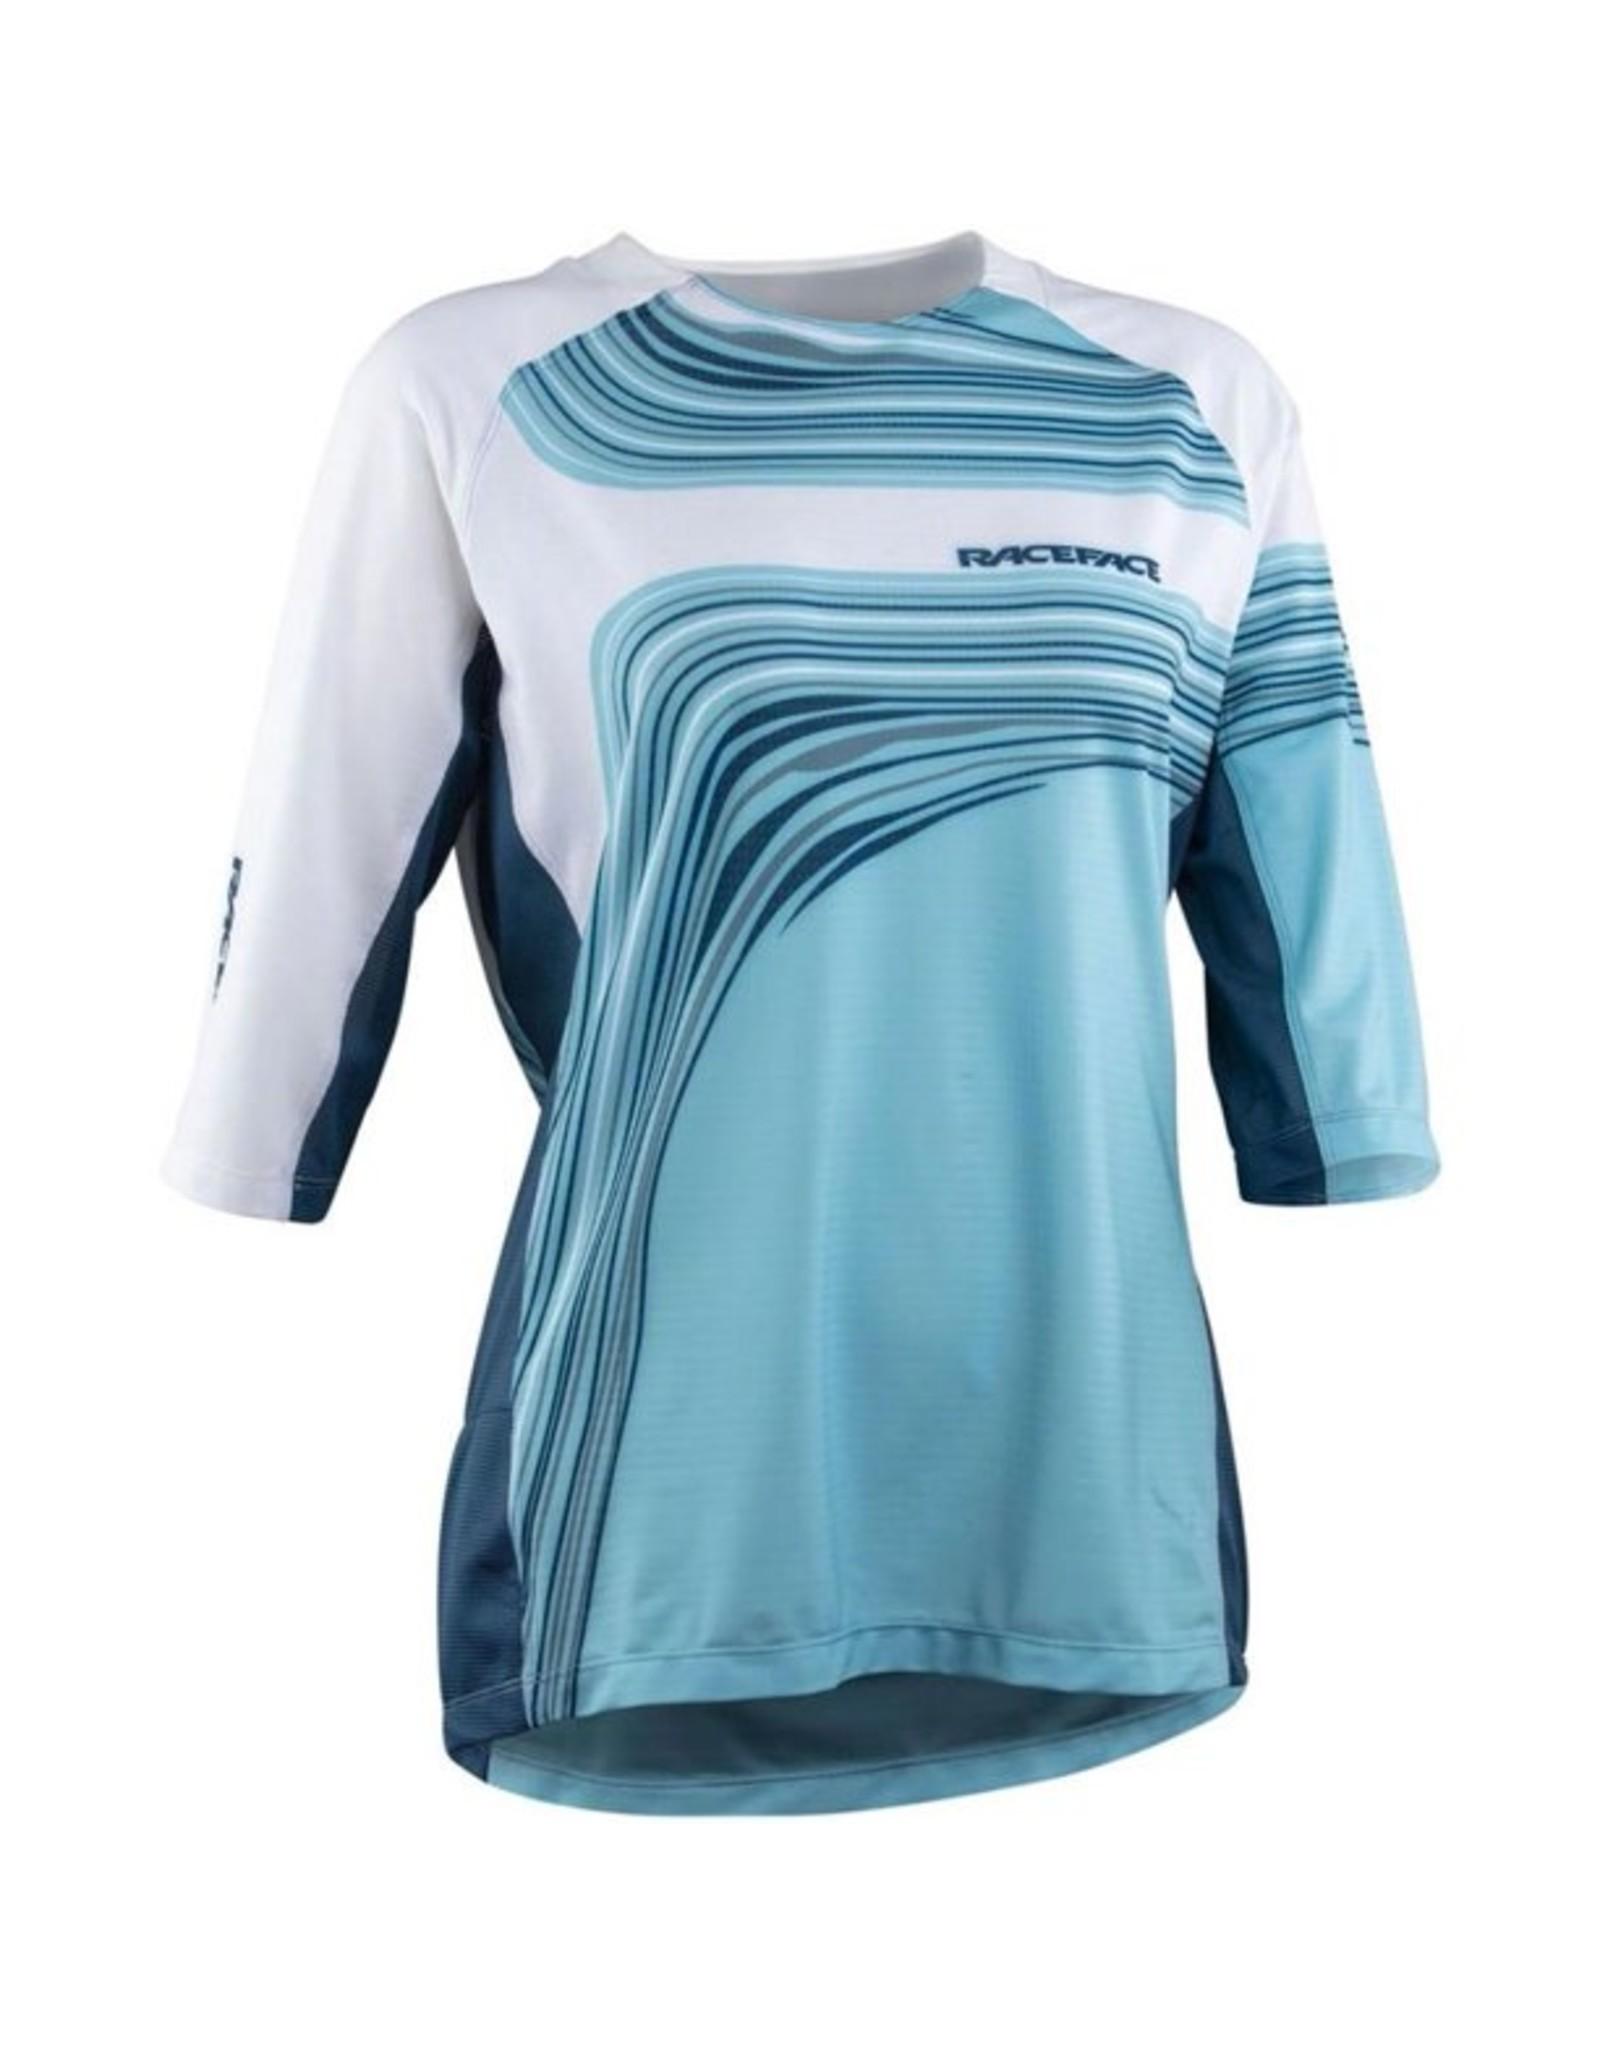 RaceFace Khyber Jersey - Sky, 3/4 Sleeve, Women's, Medium